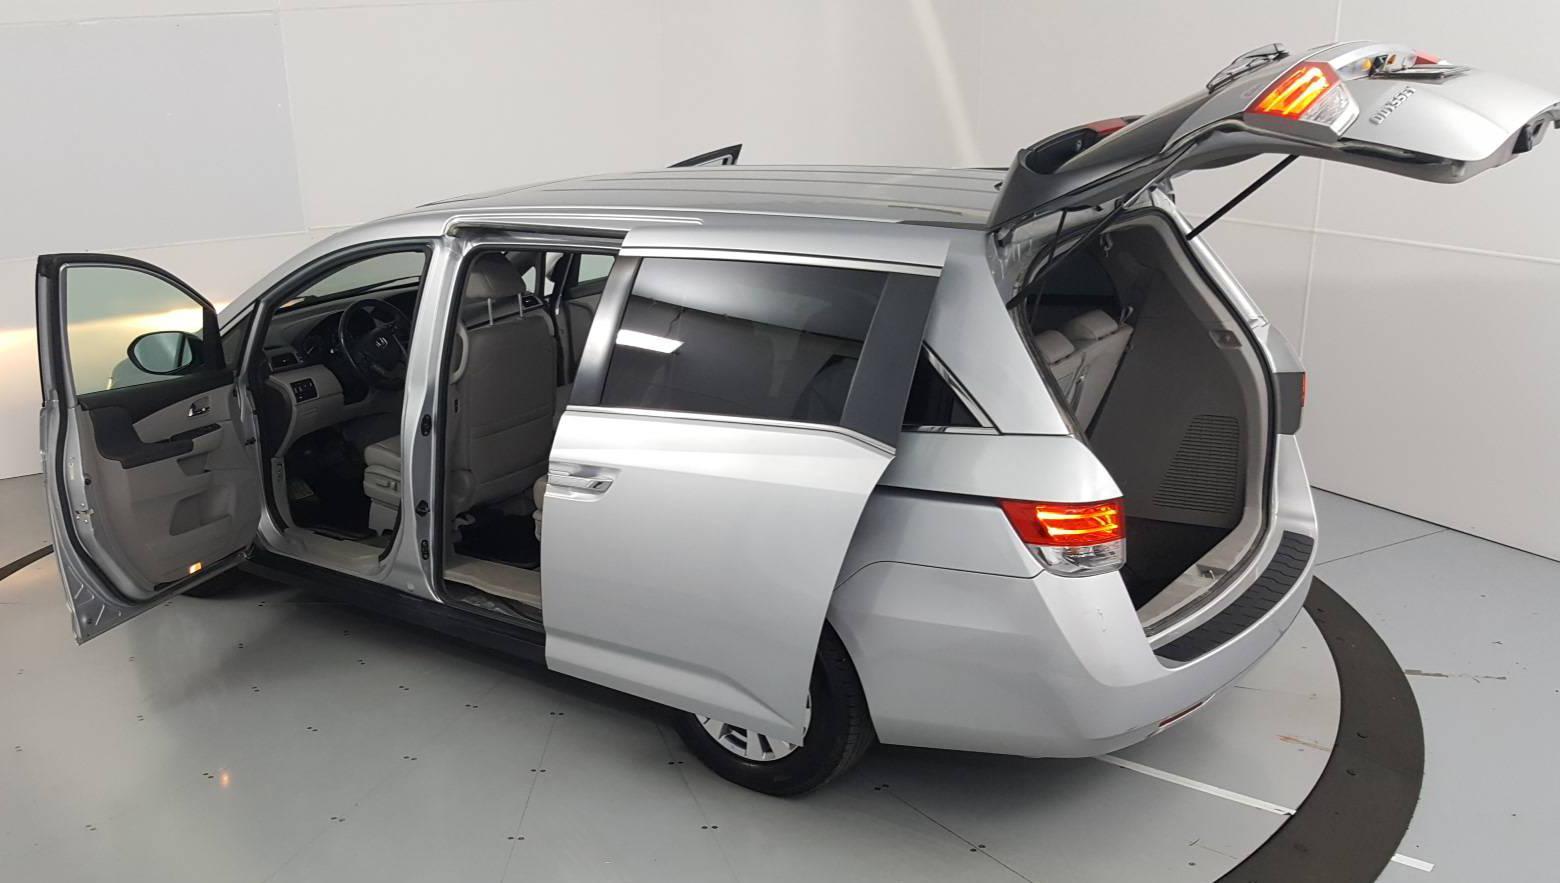 2014 Honda Odyssey Mini-van, Passenger